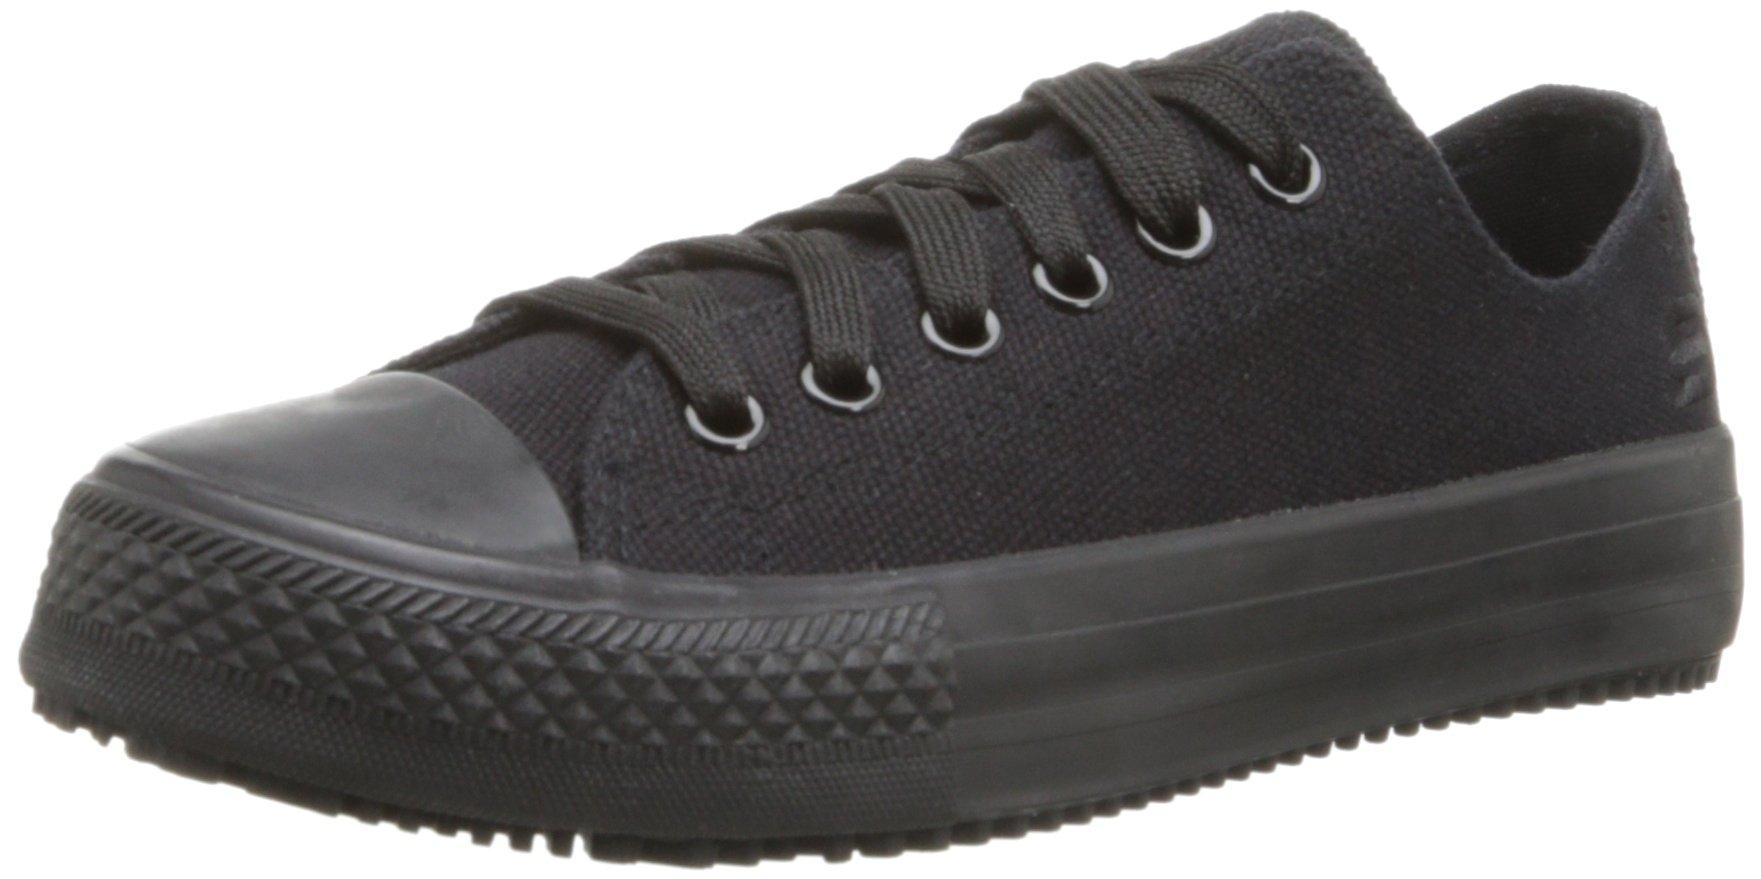 Skechers for Work Women's Gibson Arias Slip Resistant Work Shoe, Black, 10 M US